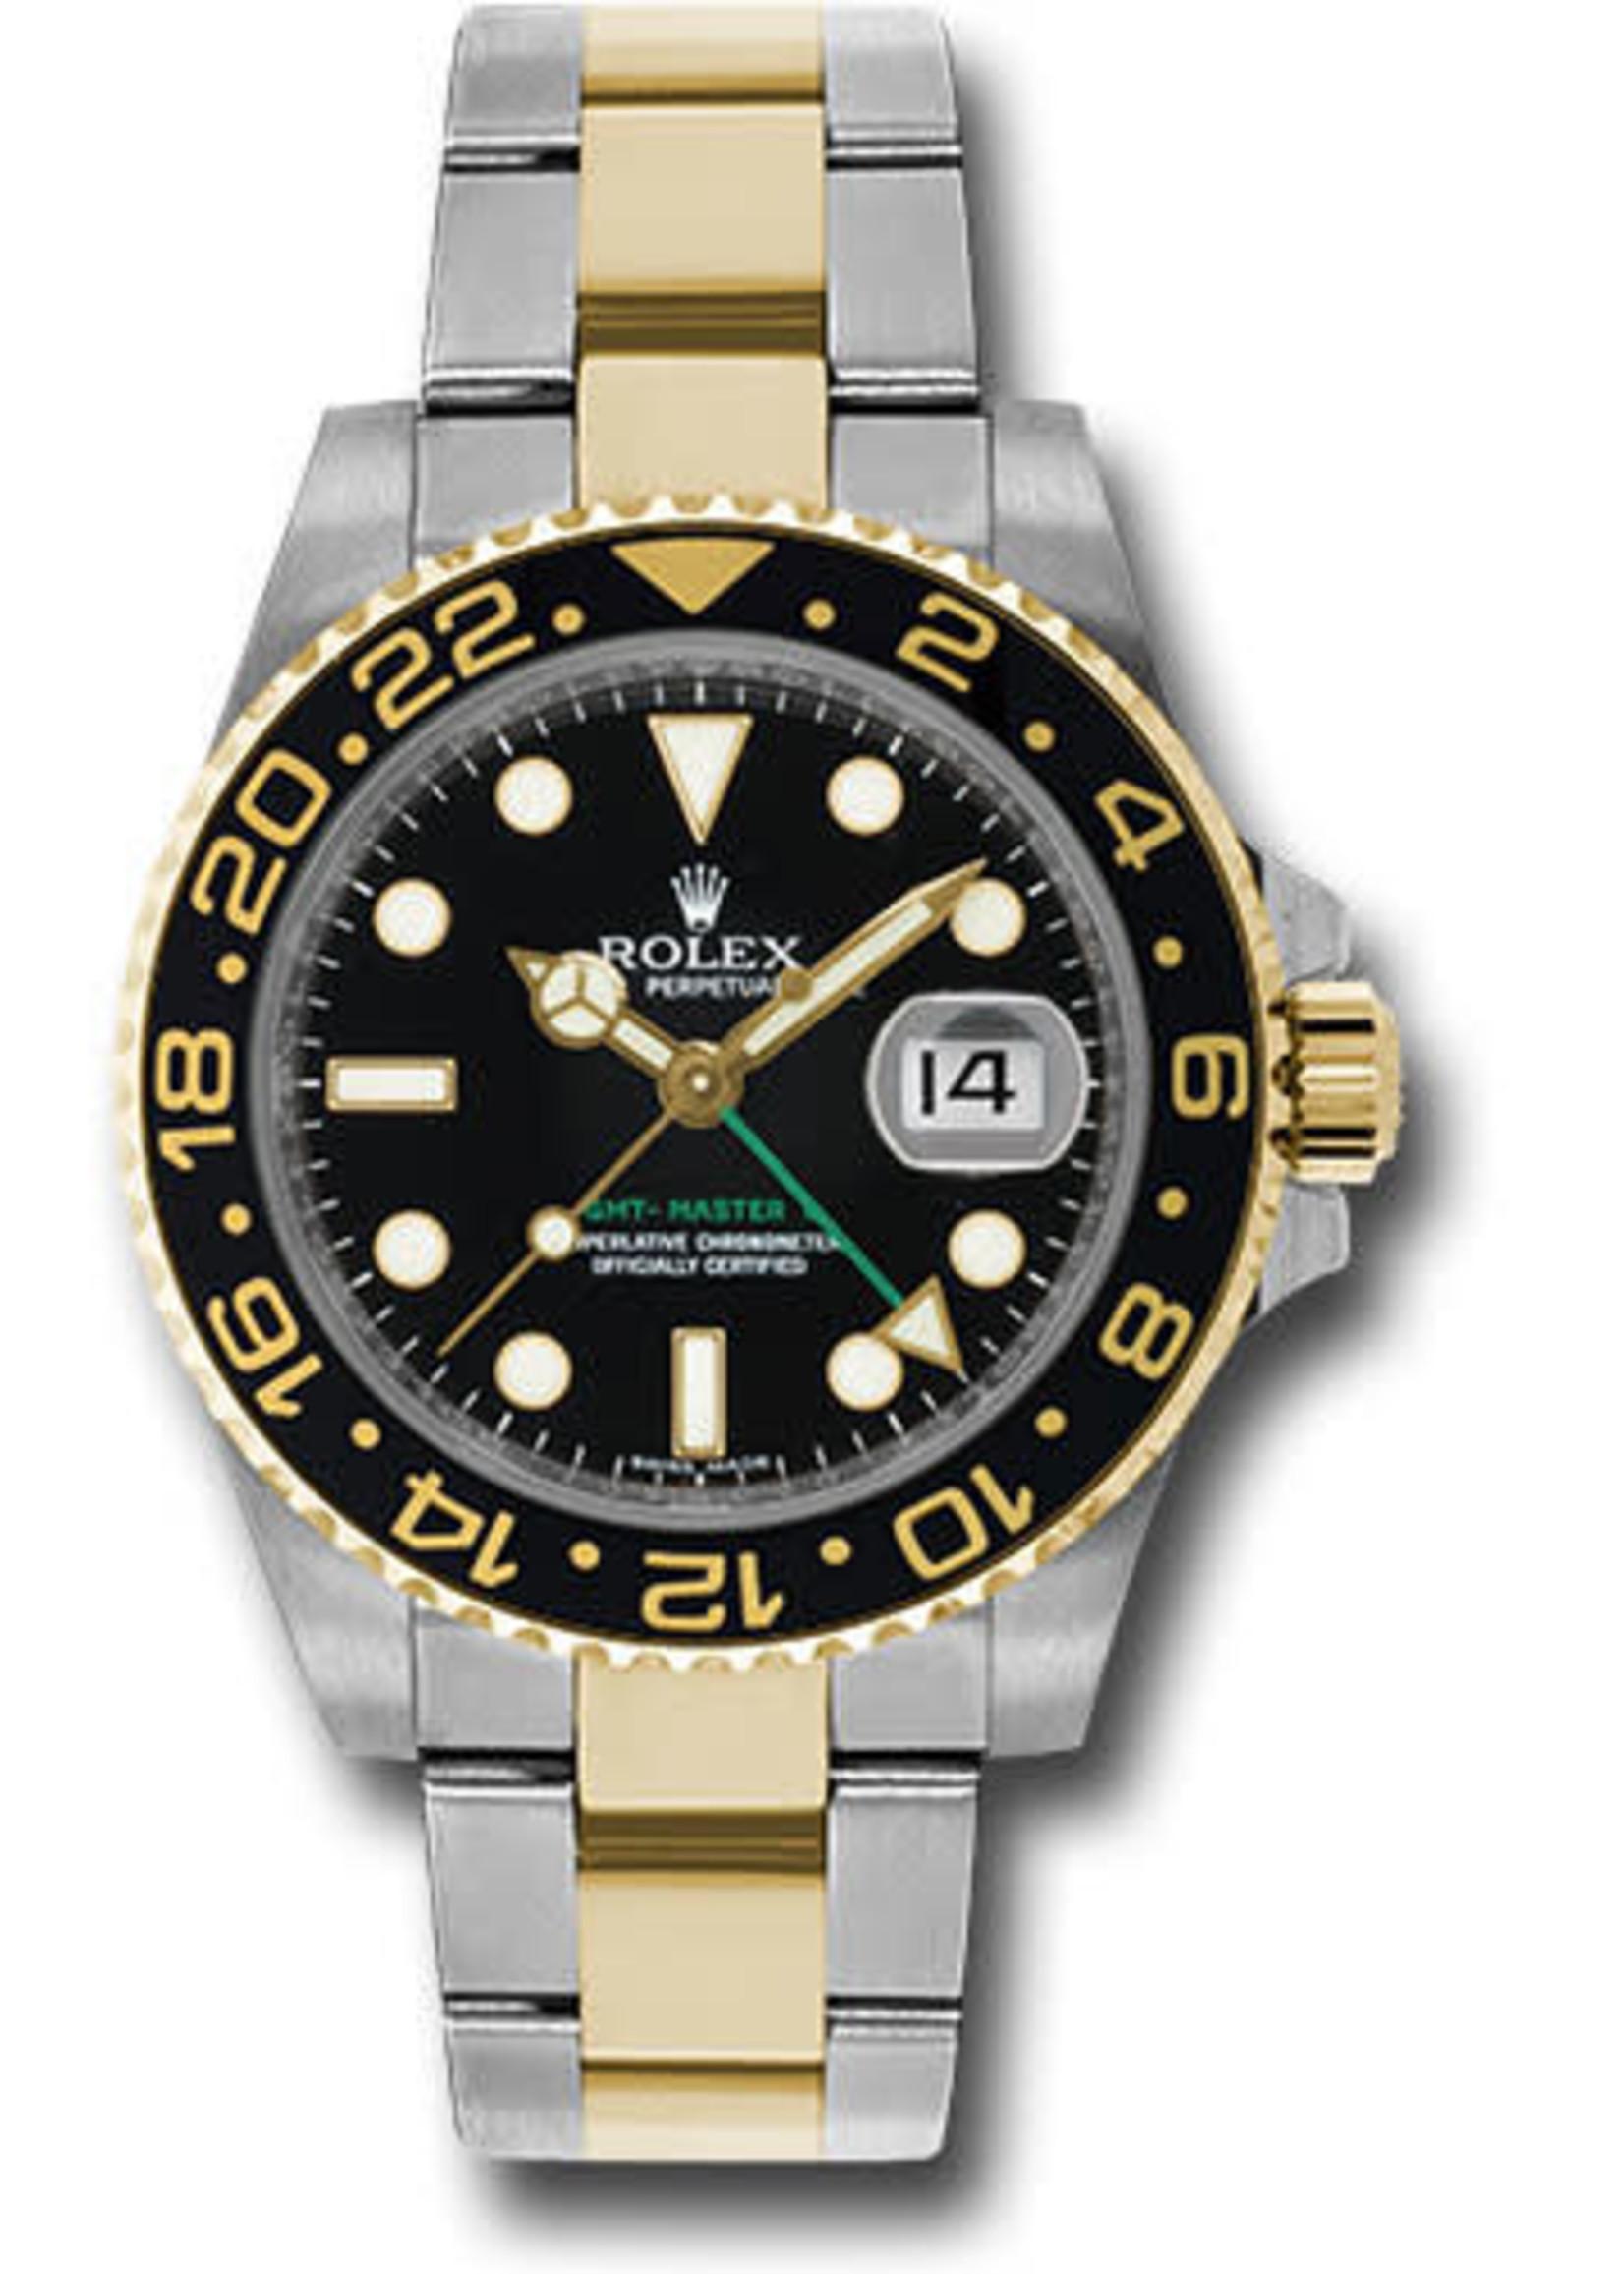 Rolex ROLEX GMT-MASTER II 40MM (2017 B+P) #116713LN